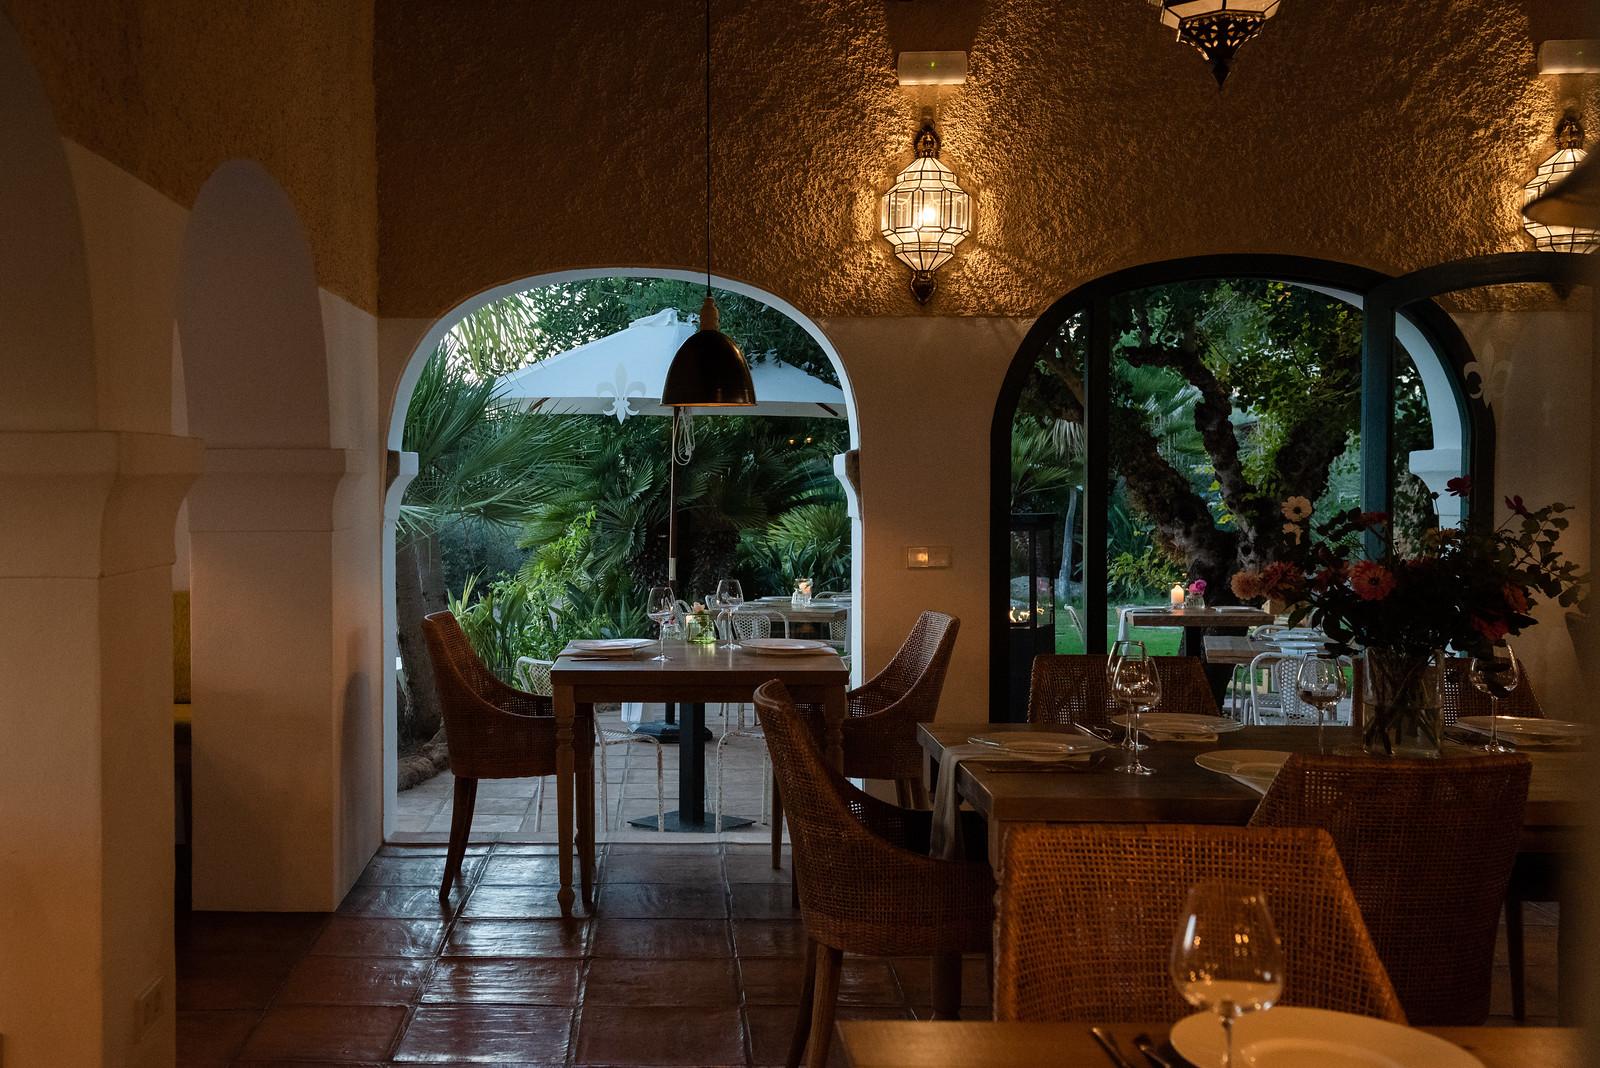 https://www.white-ibiza.com/wp-content/uploads/2020/11/cas-gasi-restaurant-2020-07.jpg